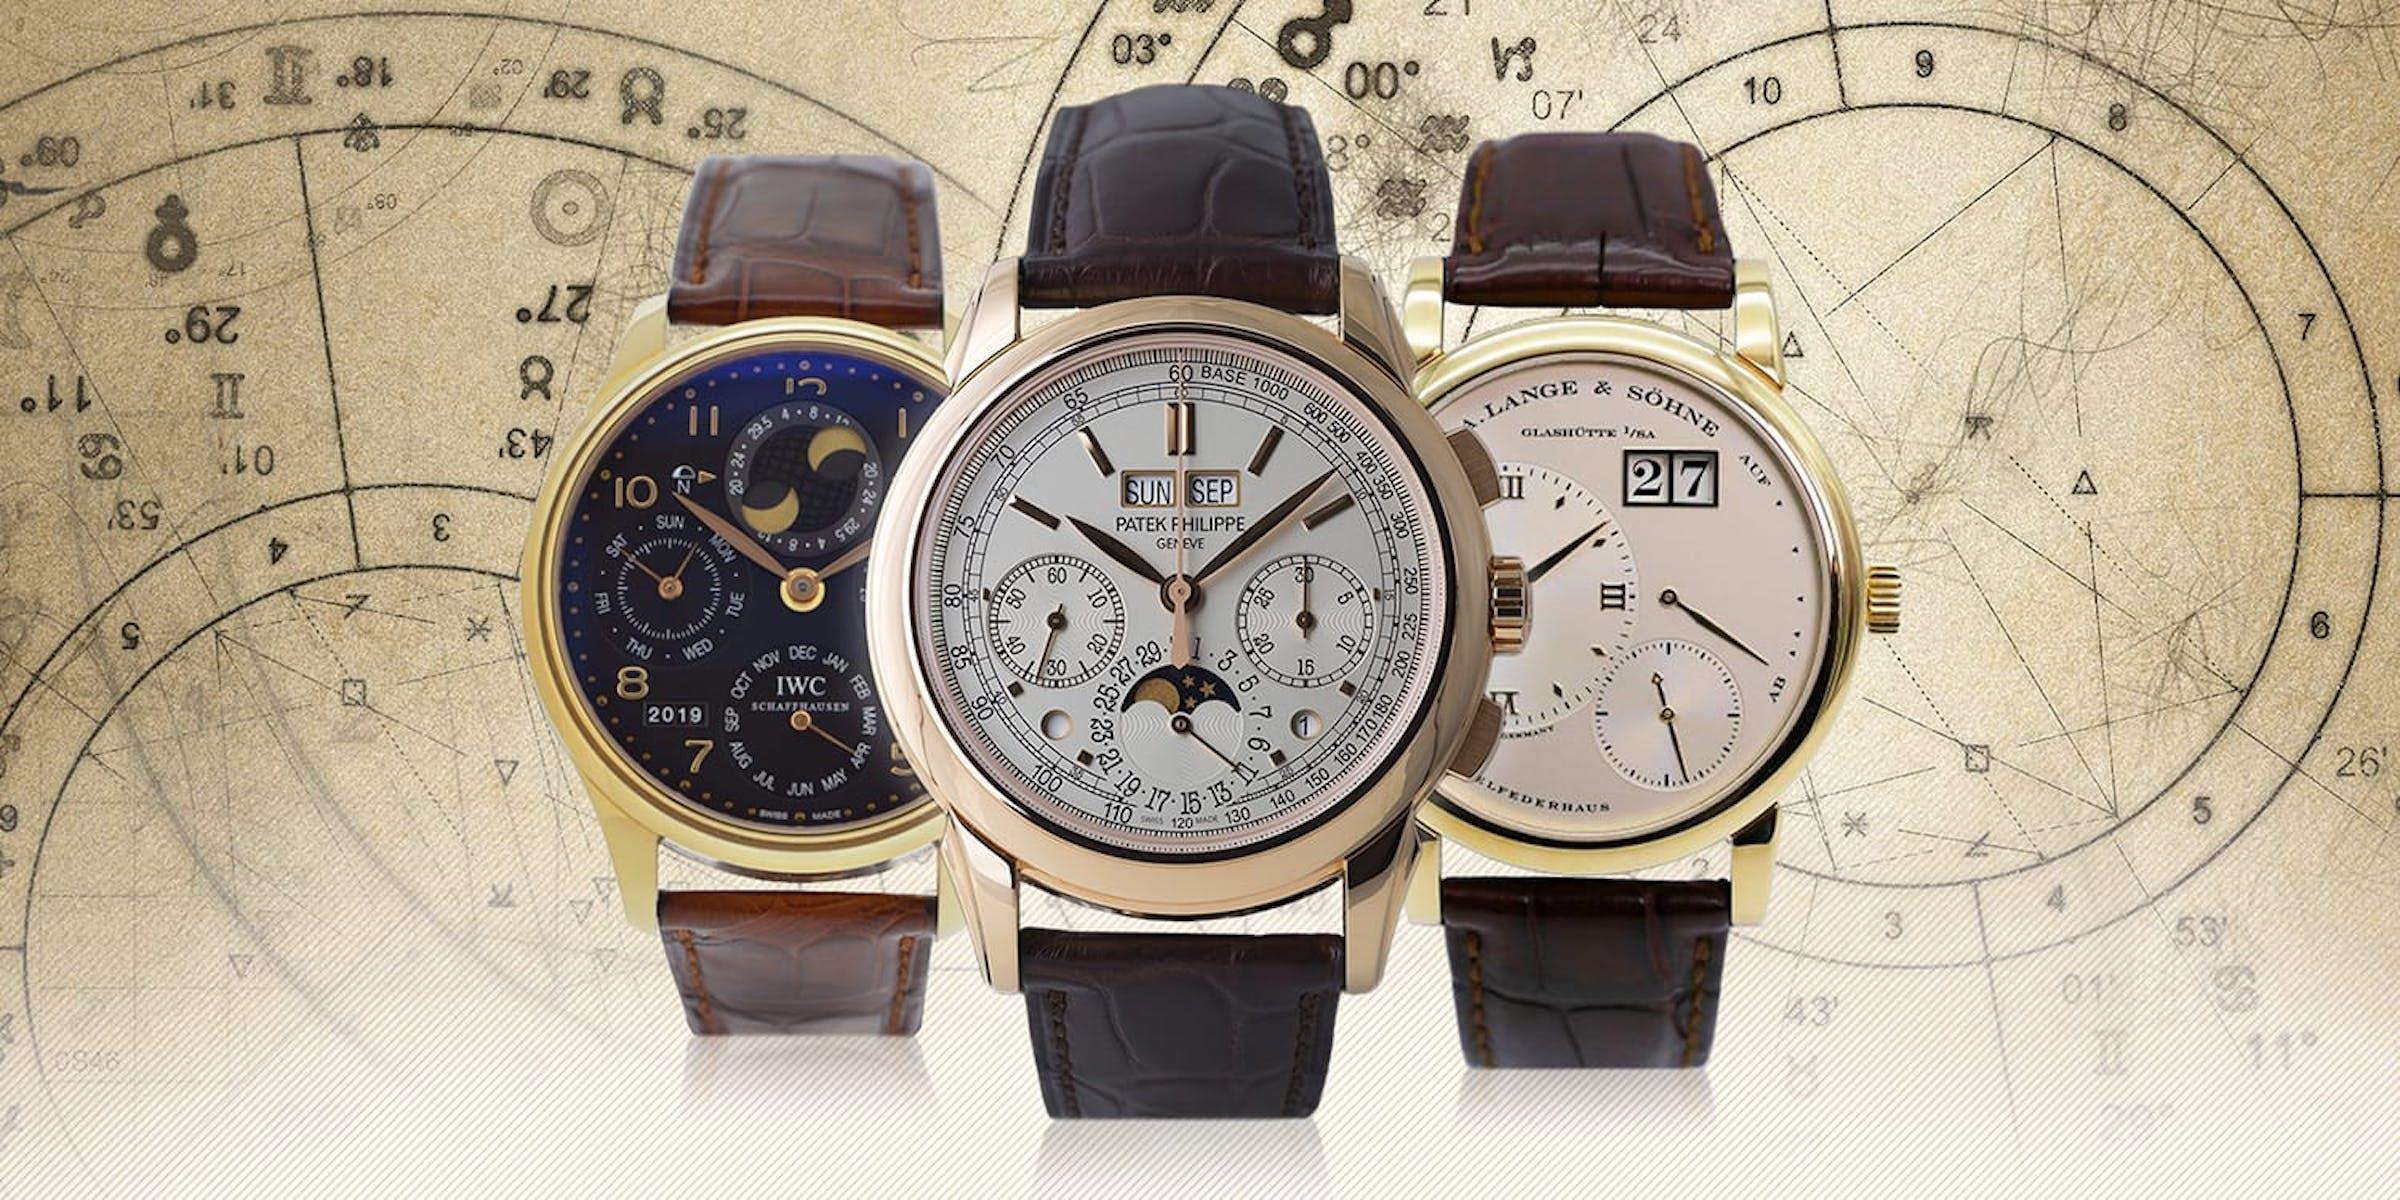 Grand Complications: Perpetual Calendar Watches